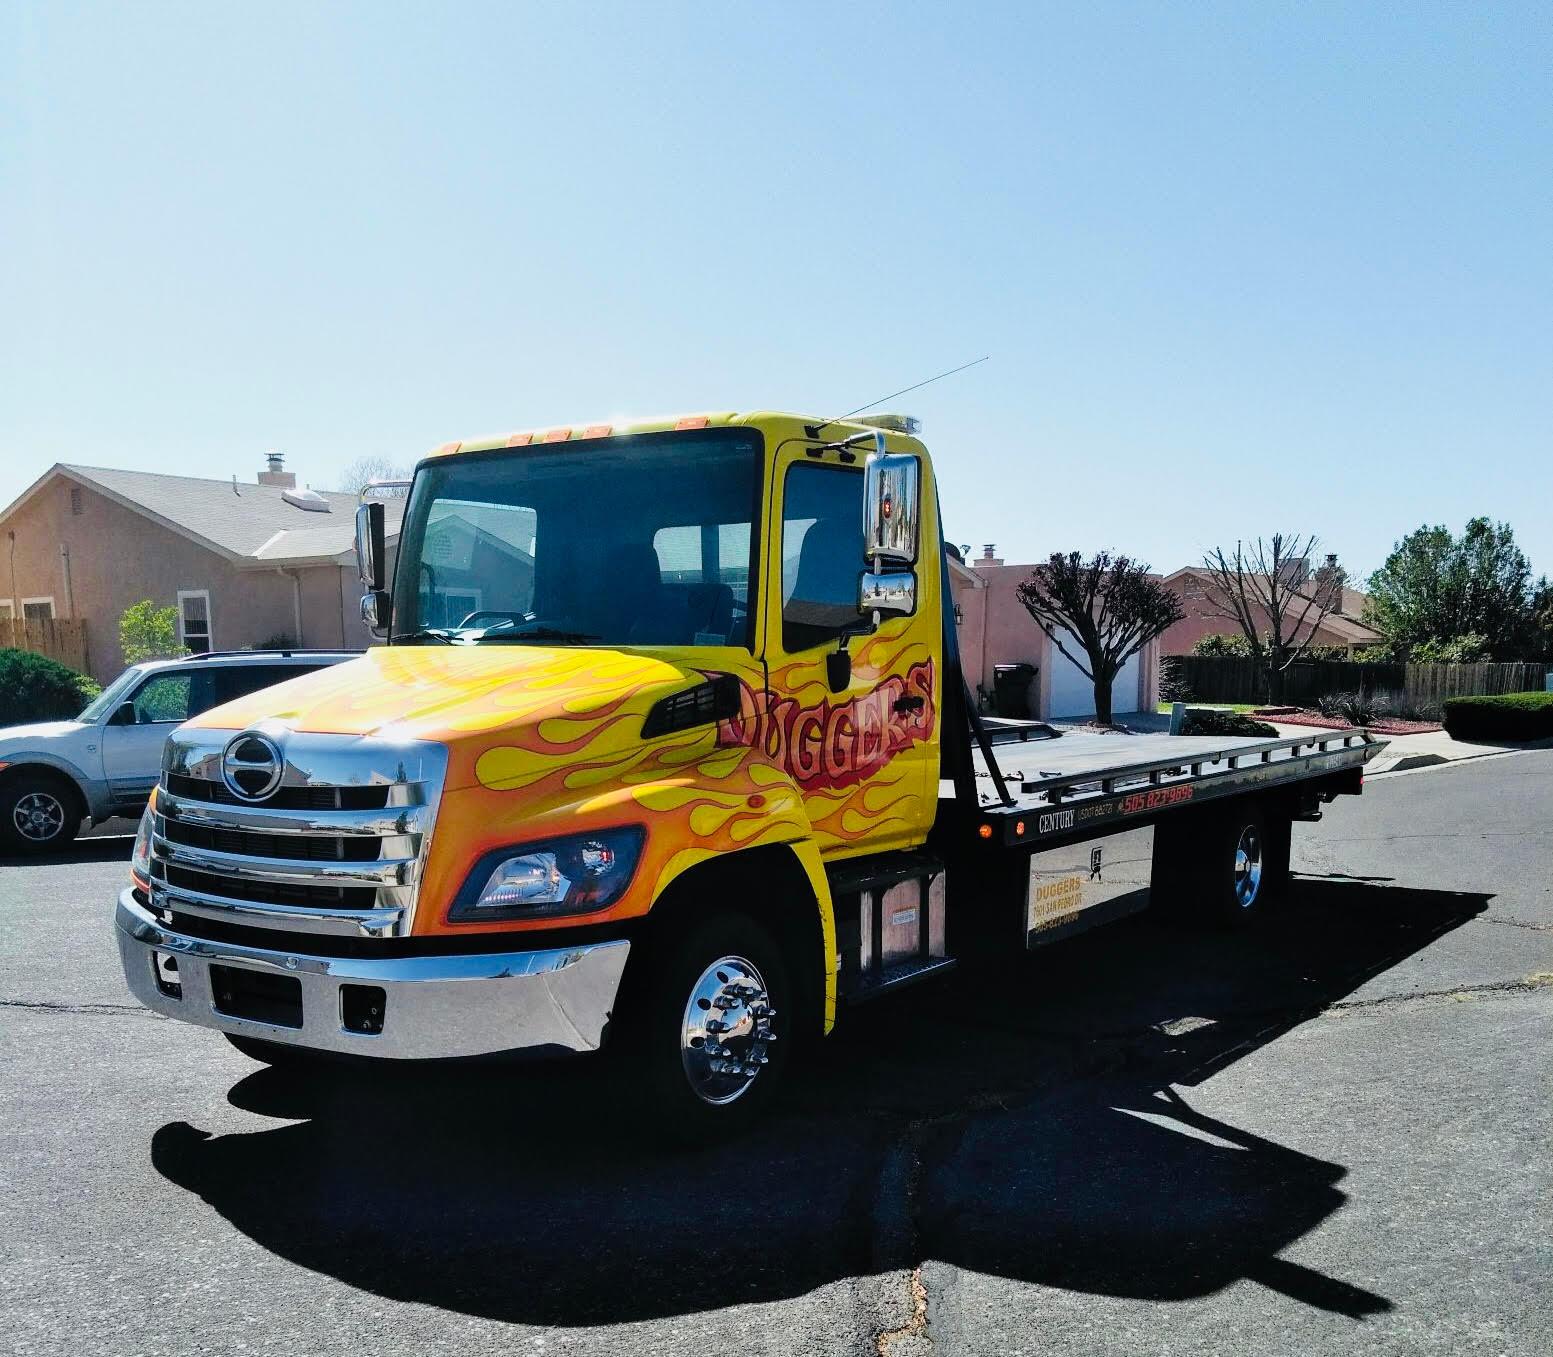 Dugger S Emergency Road Service Phoenix Arizona Az